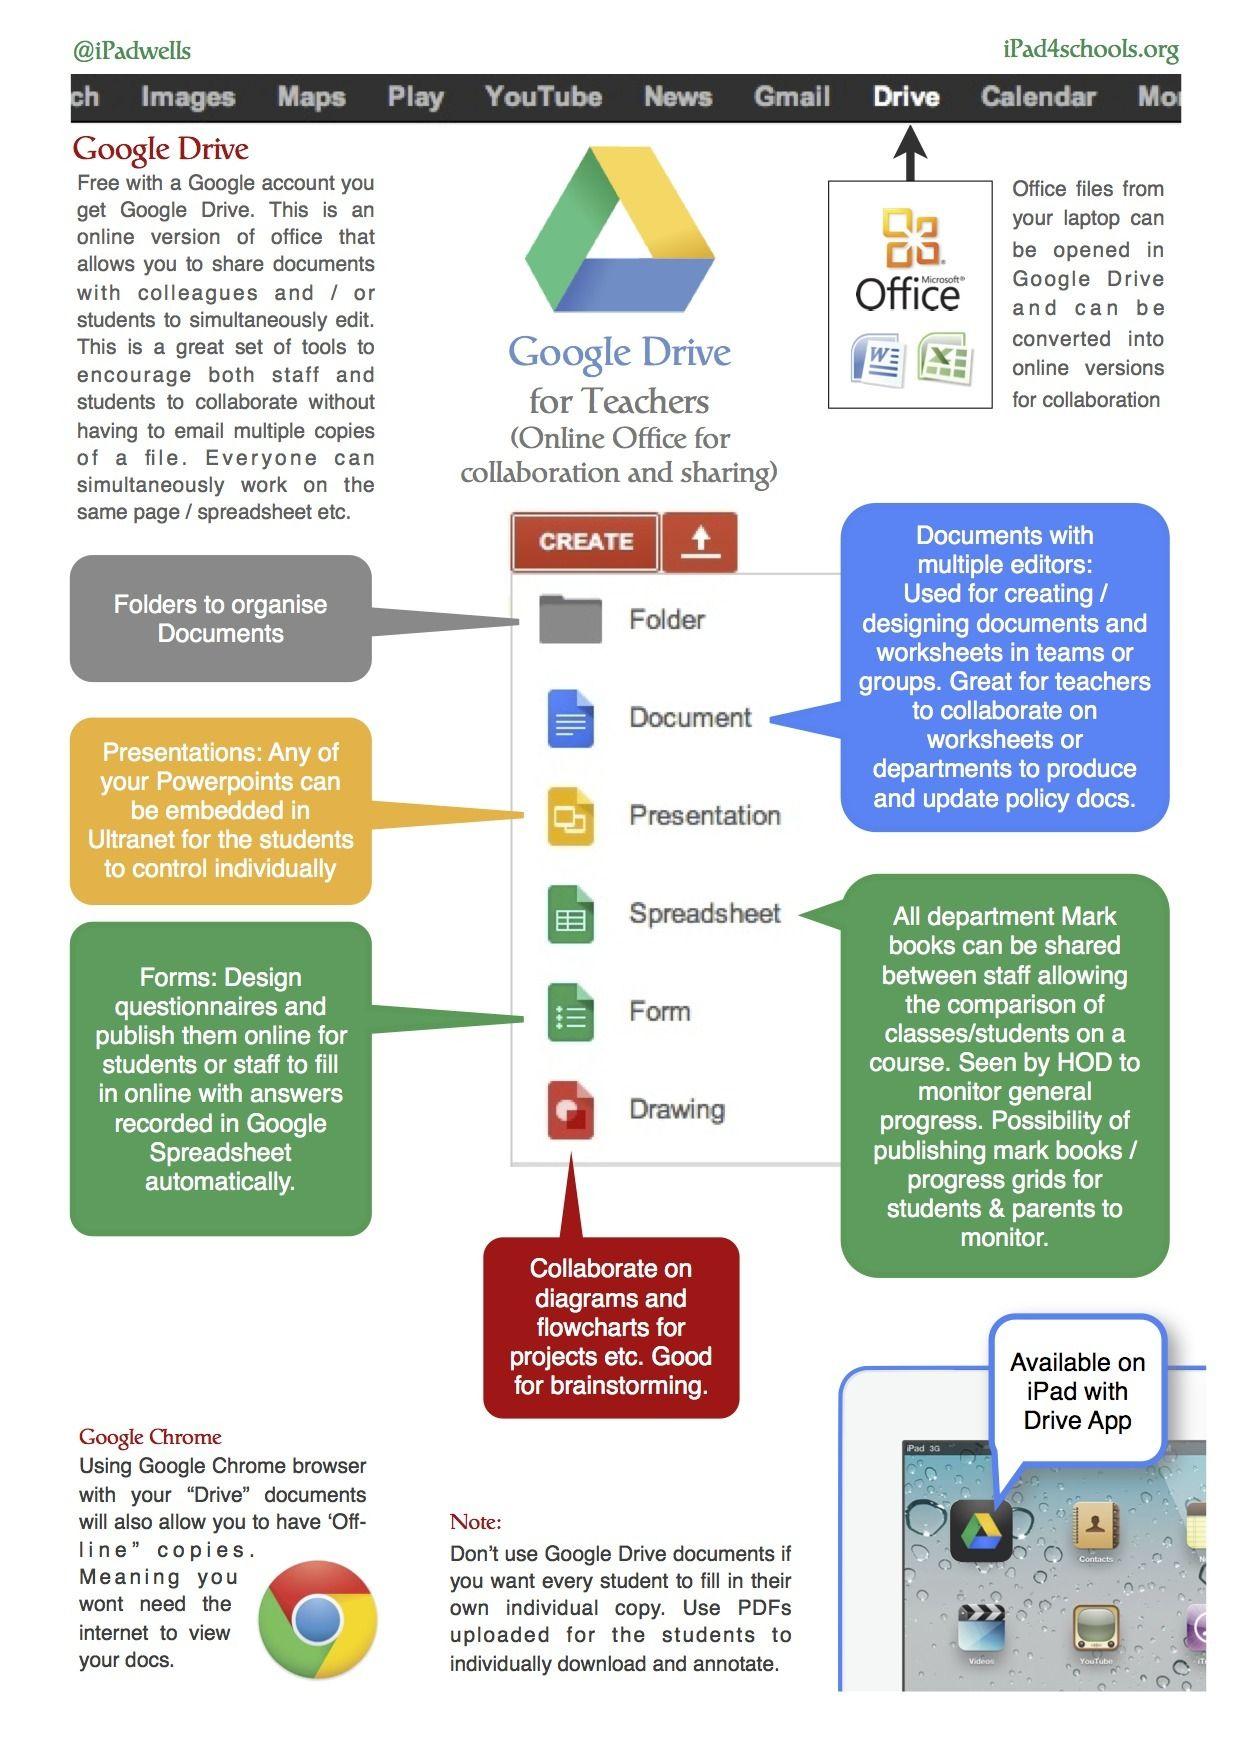 Calendario Educacyl.Google Drive Para Profes Technology Mobiles Educacion Y Tic